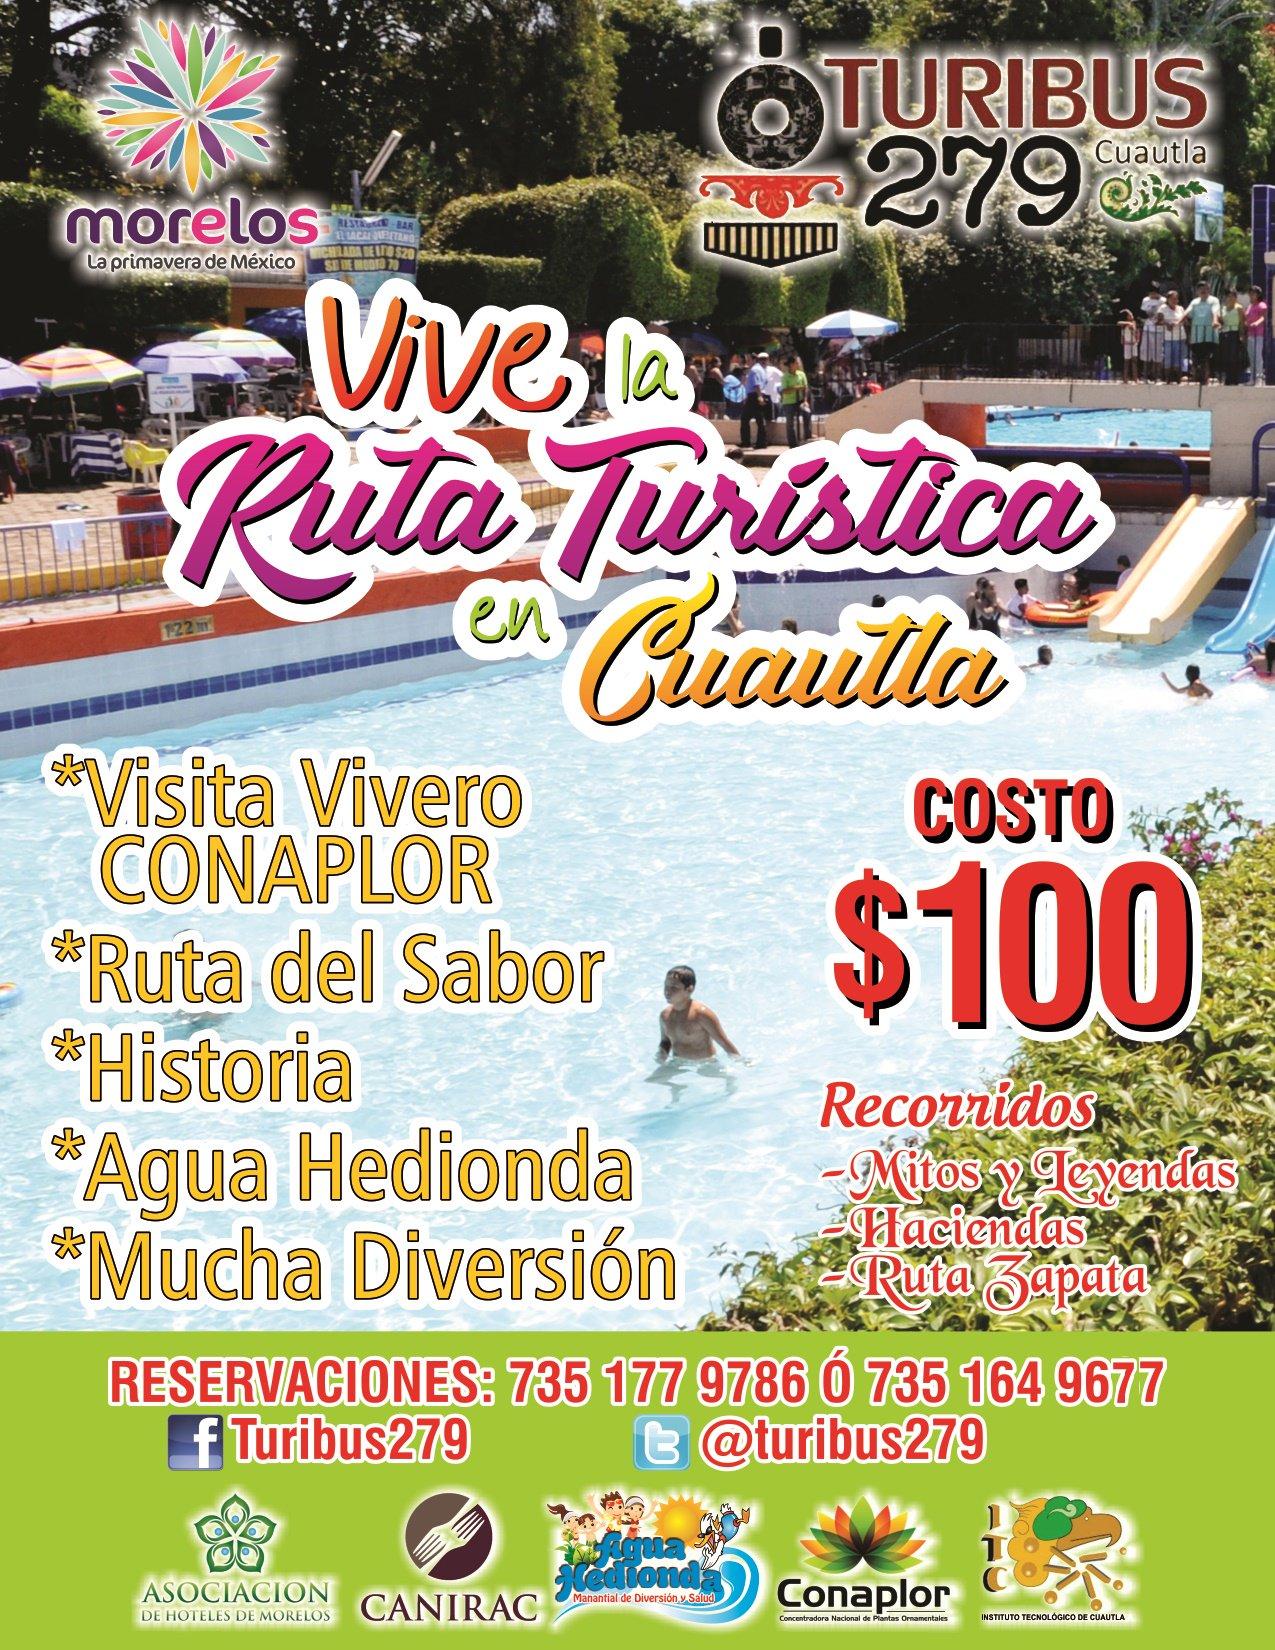 Vive la Ruta Turistica este Verano en #Cuautla #Morelos @turibus279. https://t.co/fmN0pWq8a0